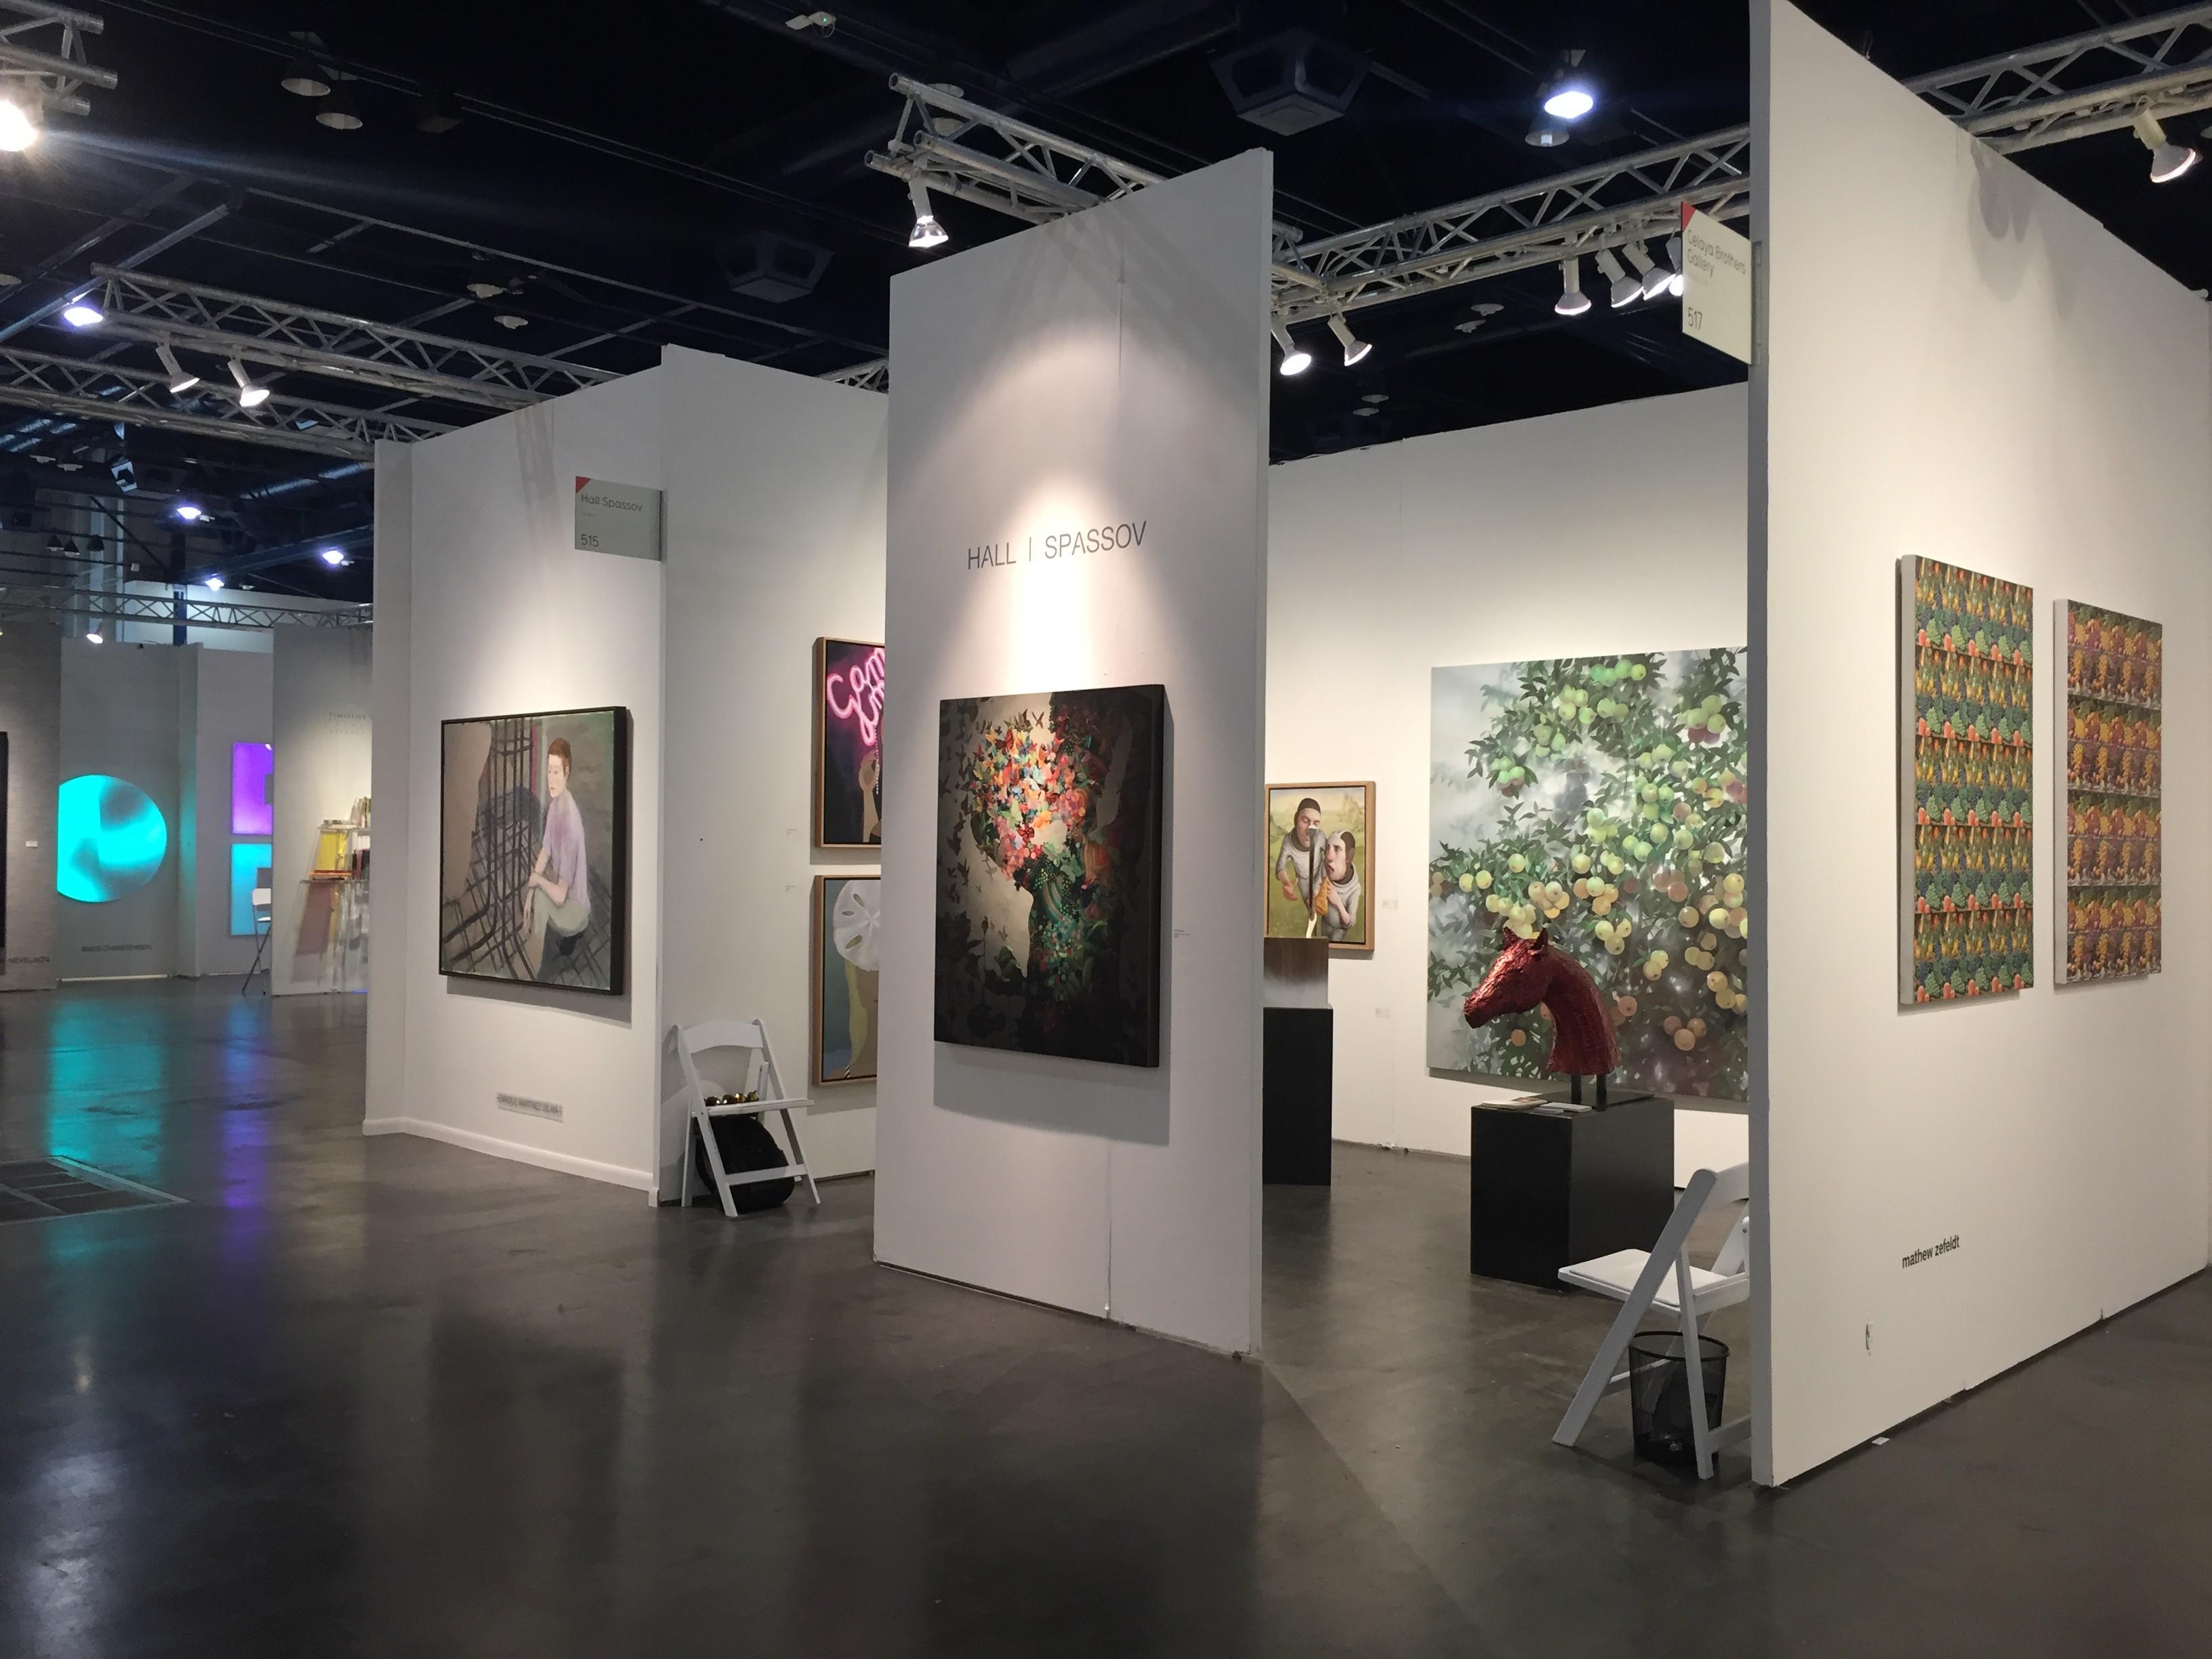 Hall Spassov Gallery | Art Fairs